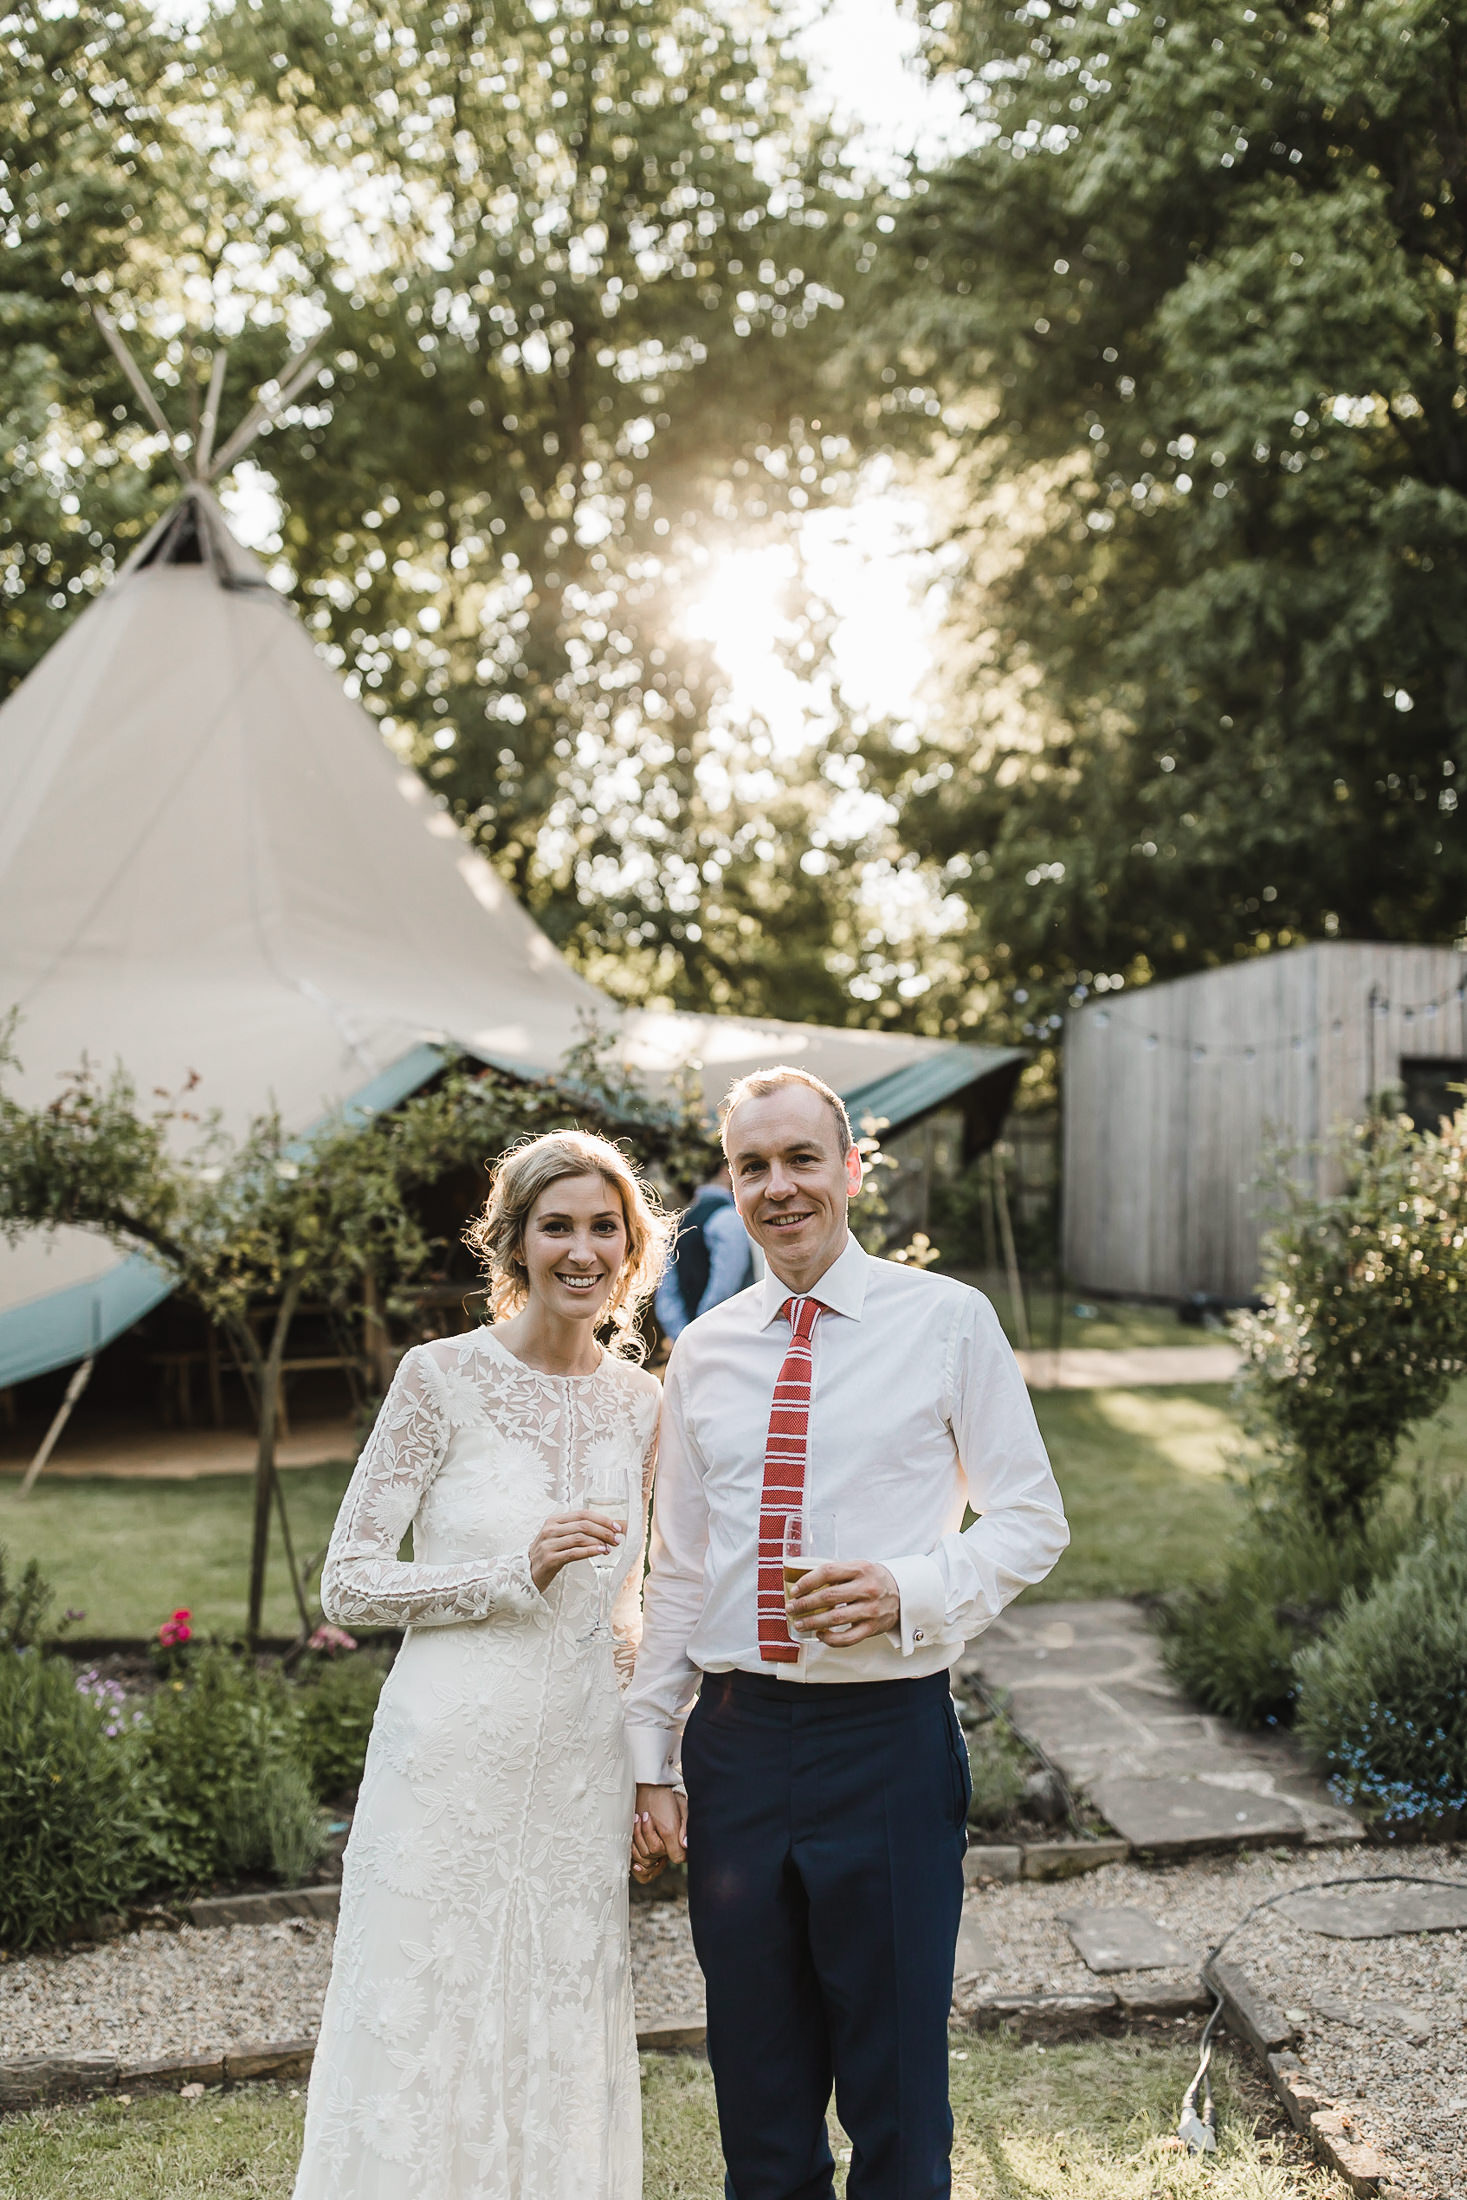 Roundhay-Leeds-Backyard-Wedding-Becs-Chris-204.jpg